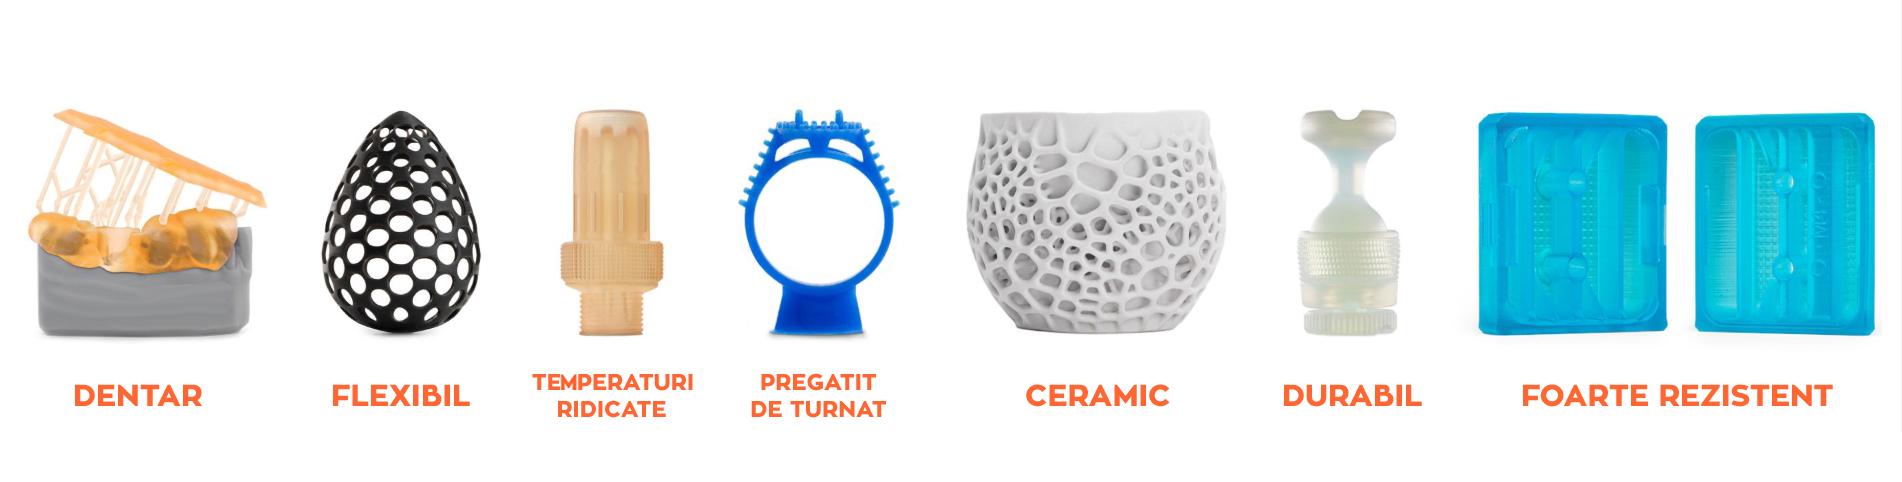 3d print SLA materiale diferite calitate superioara detalii mari